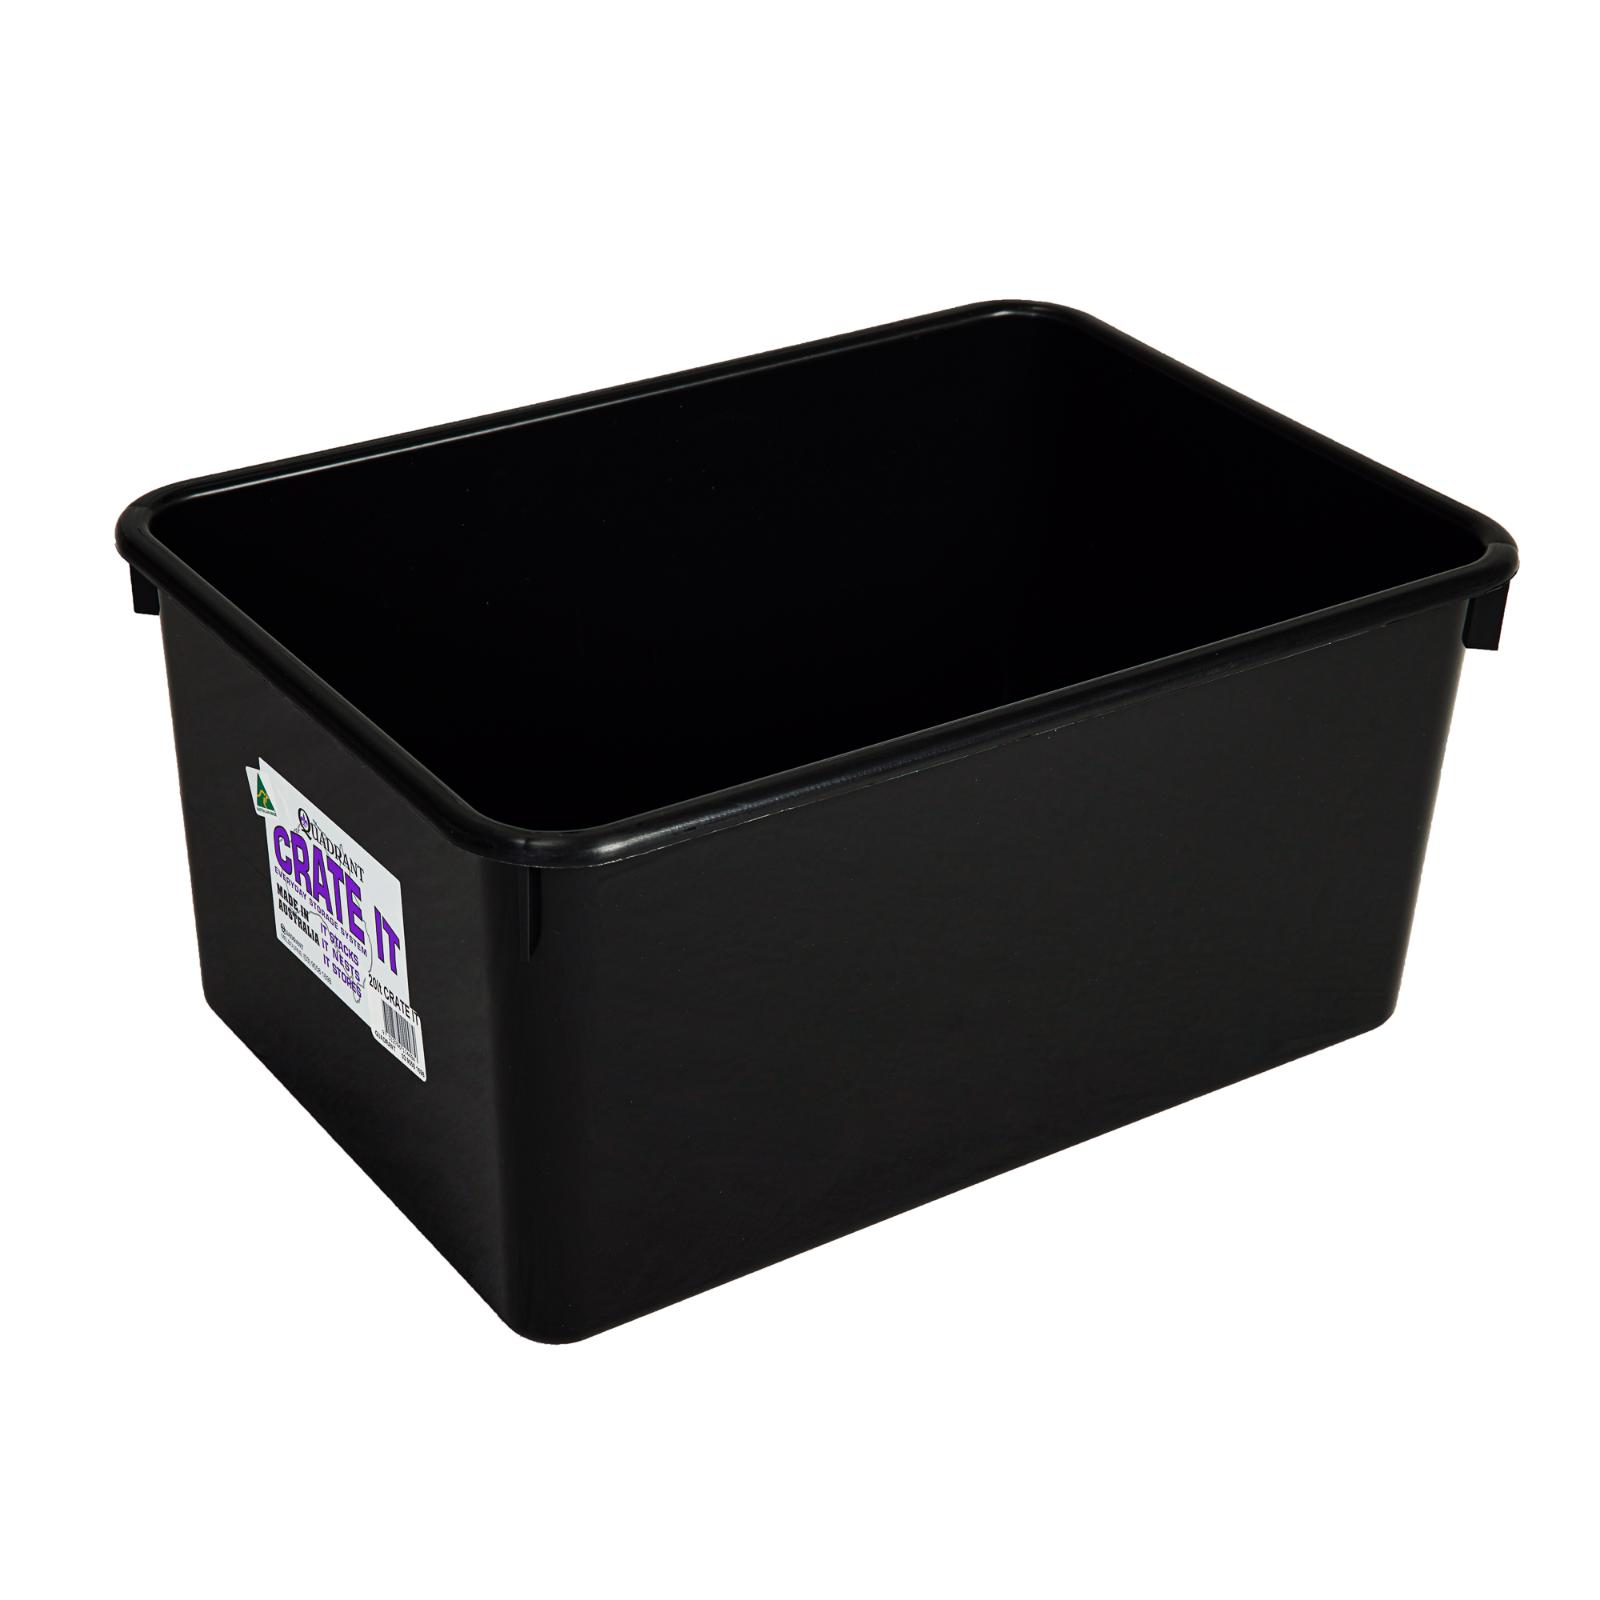 10x Large Heavy Duty 20L Black Plastic Basin Tub Containers Storage Crate Box AU